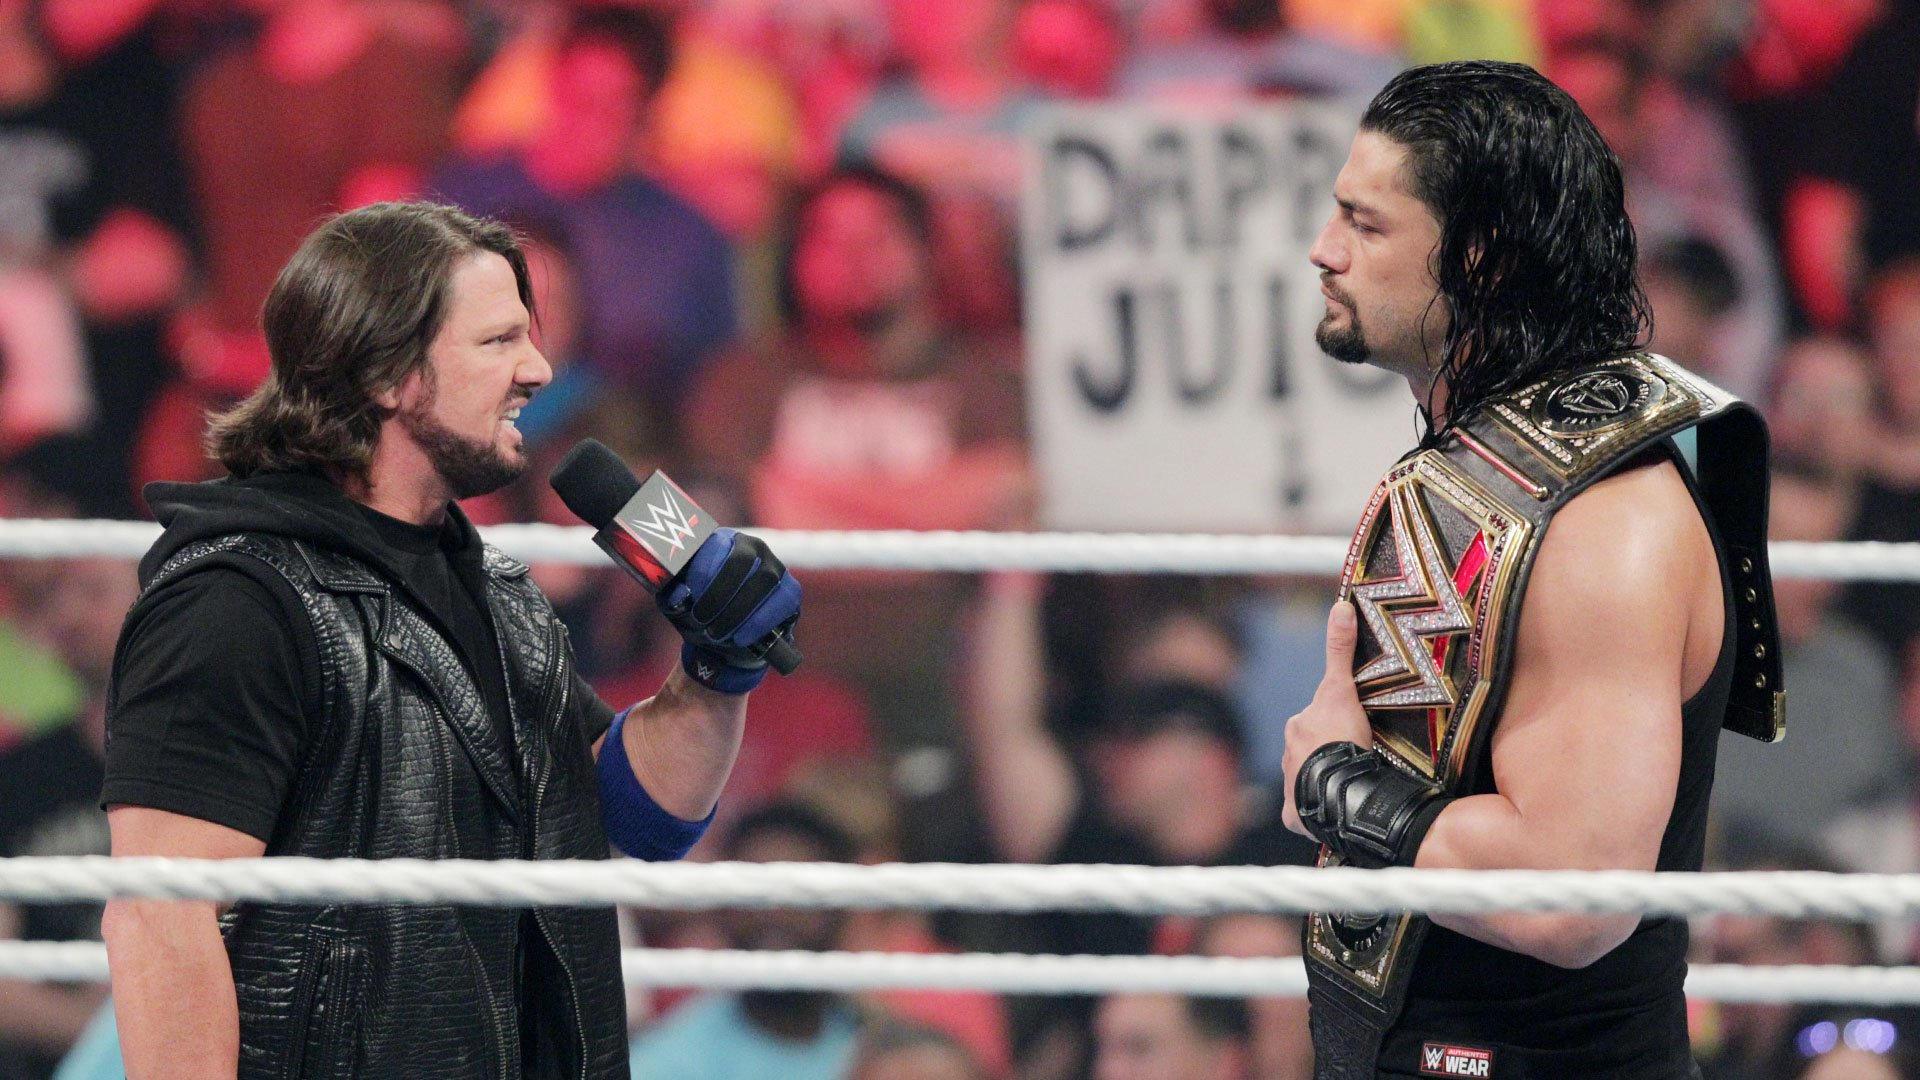 Resultats WWE RAW 16 mai 2016